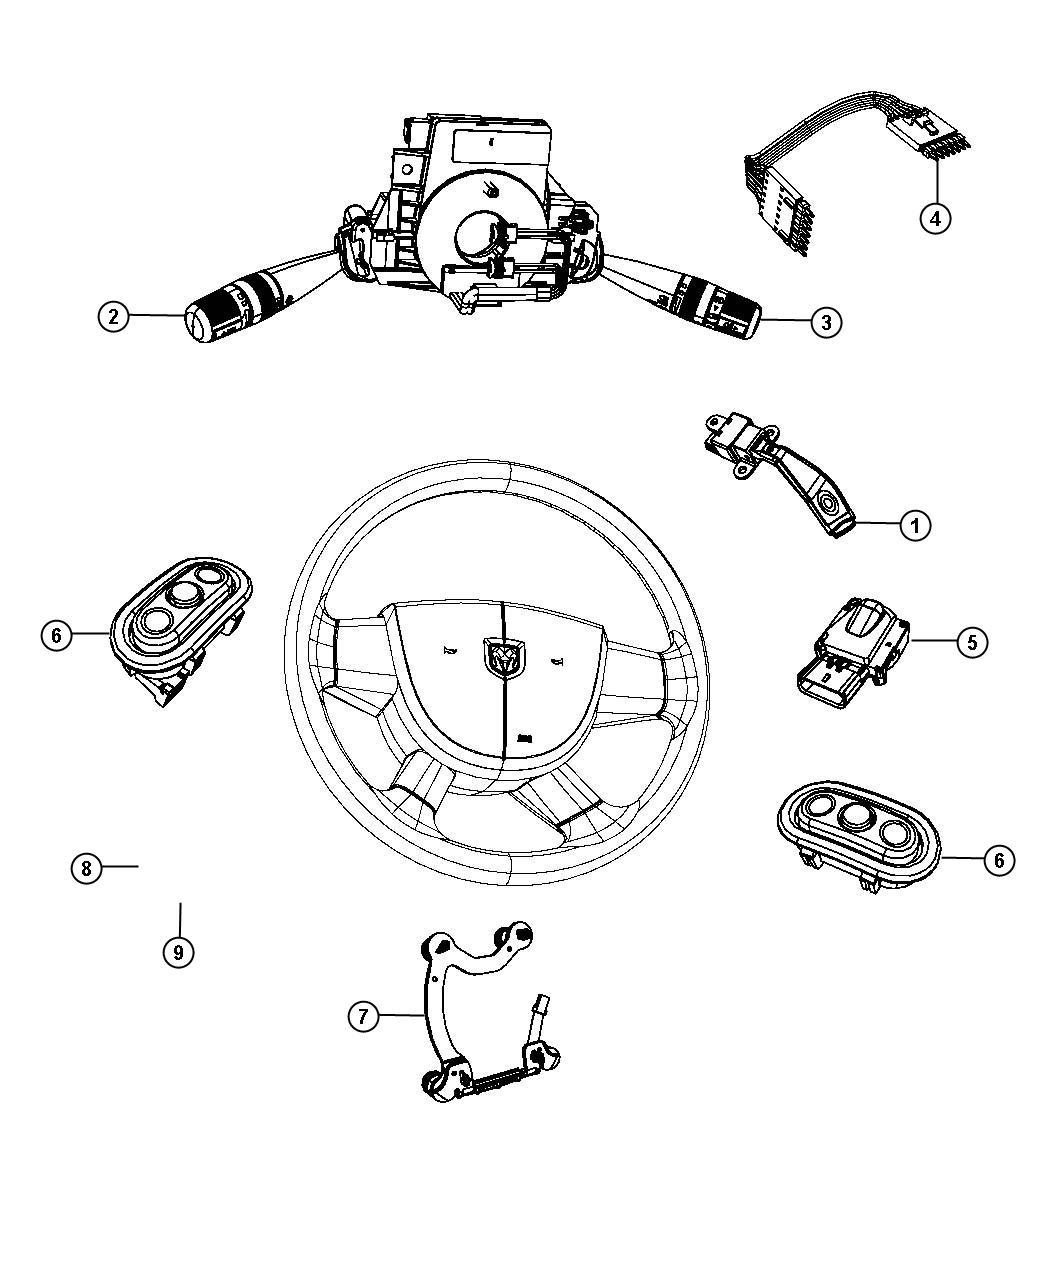 2011 Chrysler Sebring Wiring. Steering wheel. Trim: [no